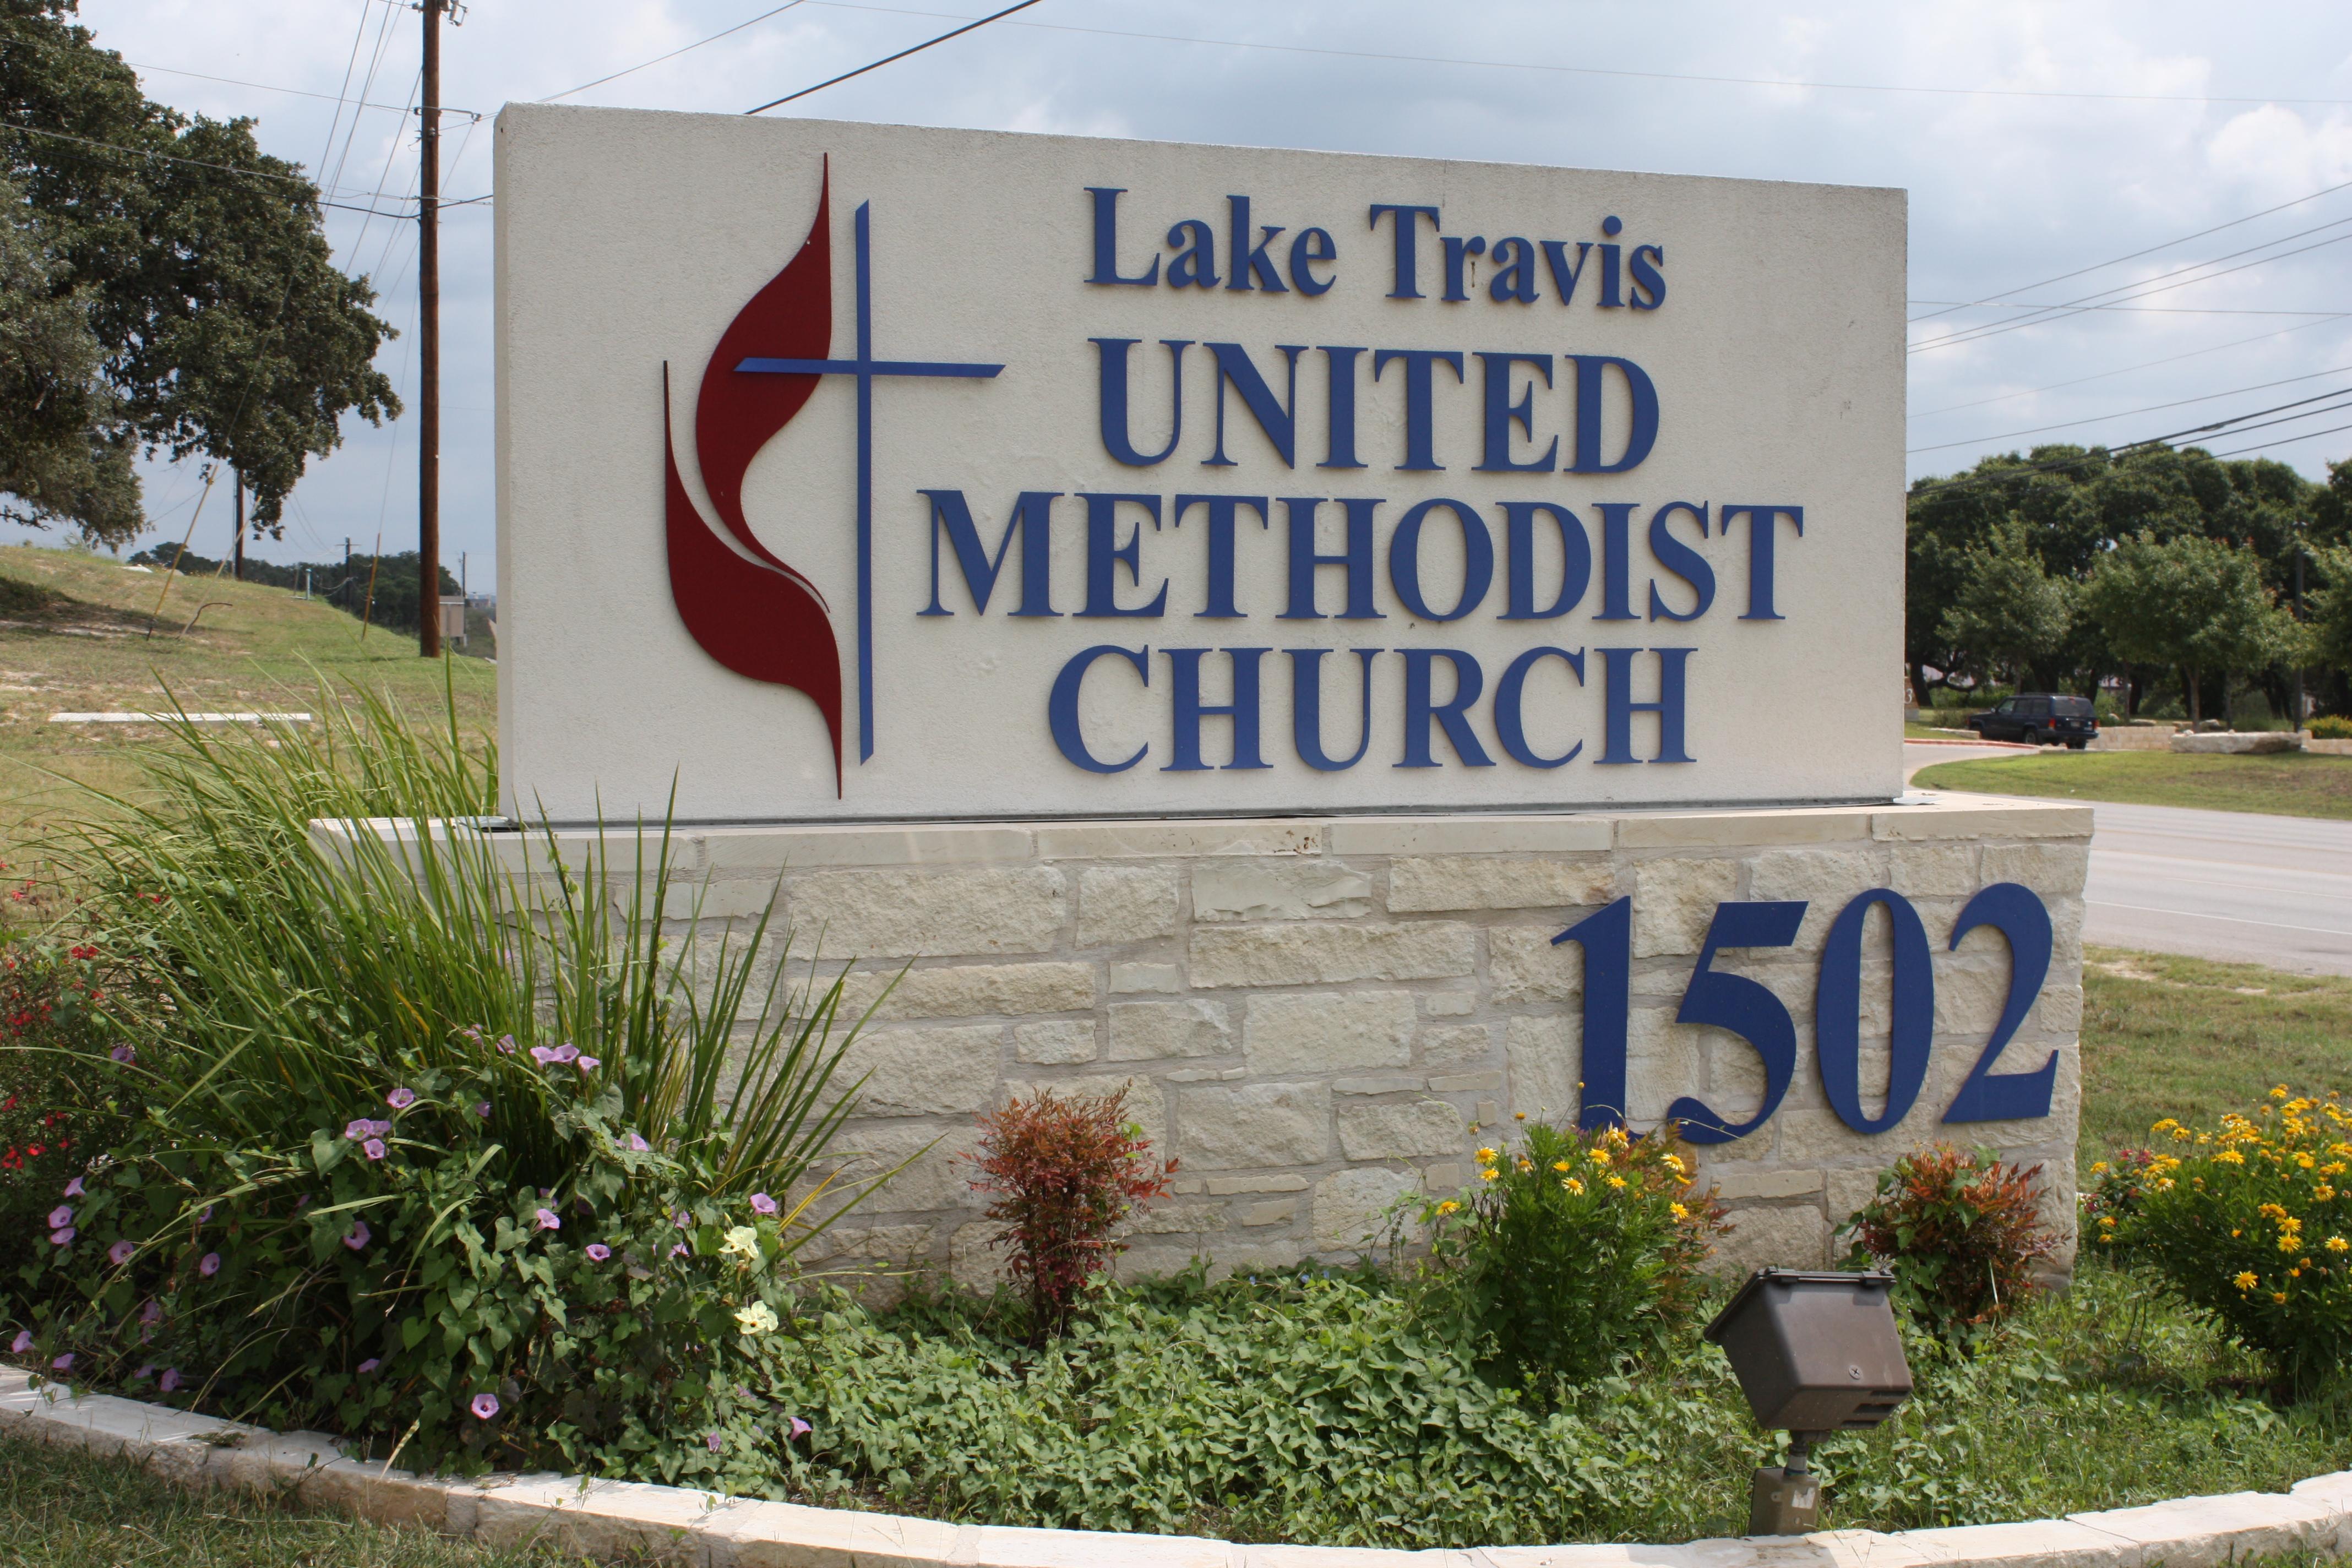 Lake Travis United Methodist Church